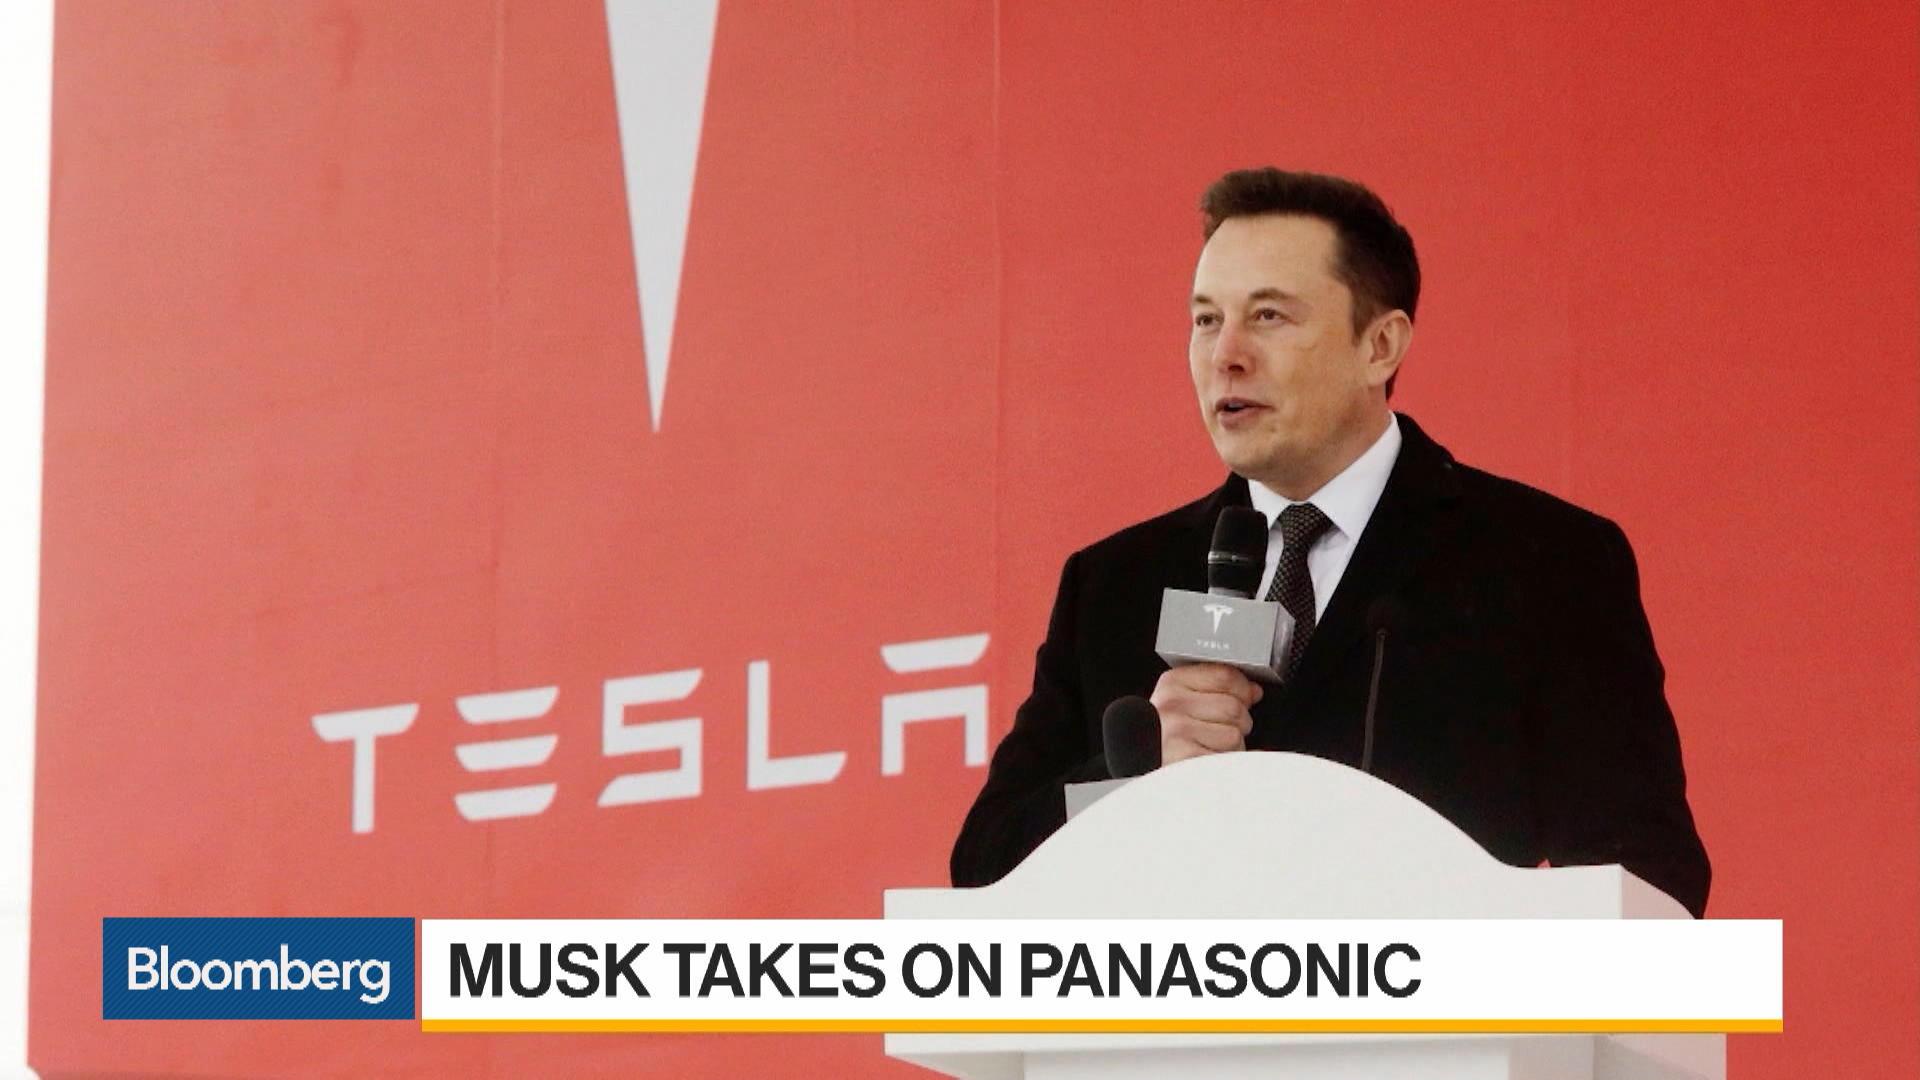 Musk Takes Aim at Panasonic Over Tesla Battery Production